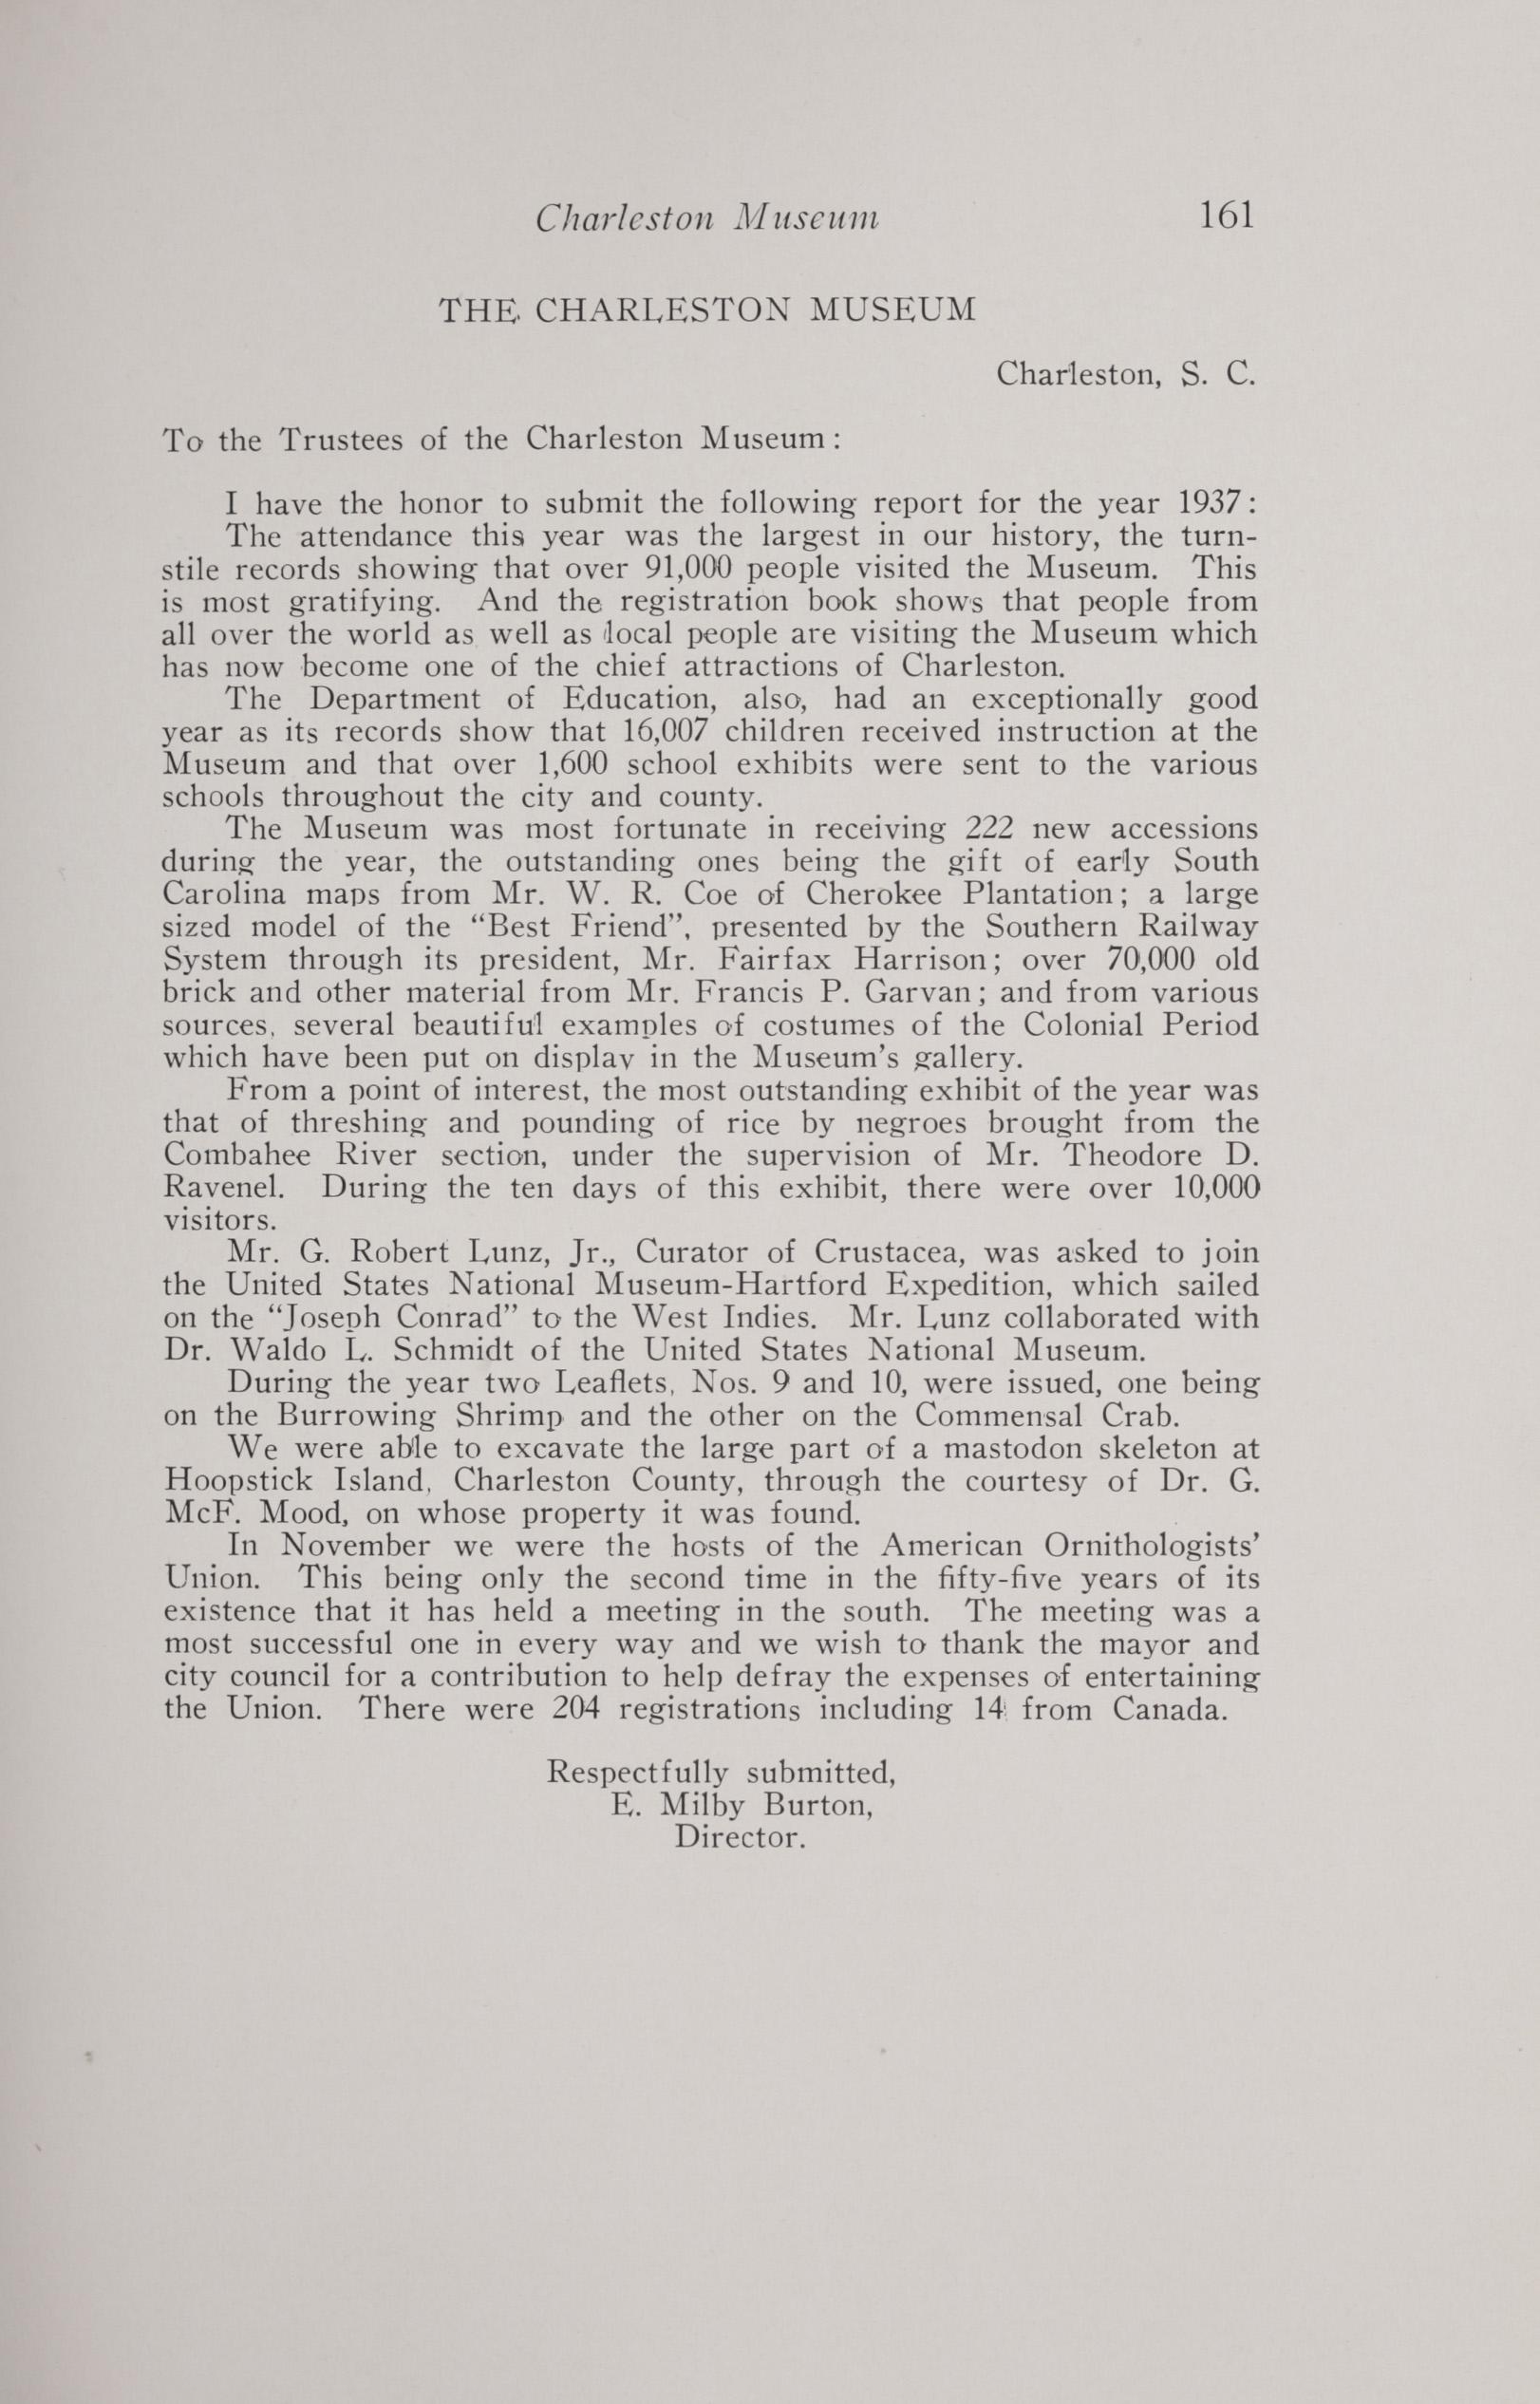 Charleston Yearbook, 1937, page 161